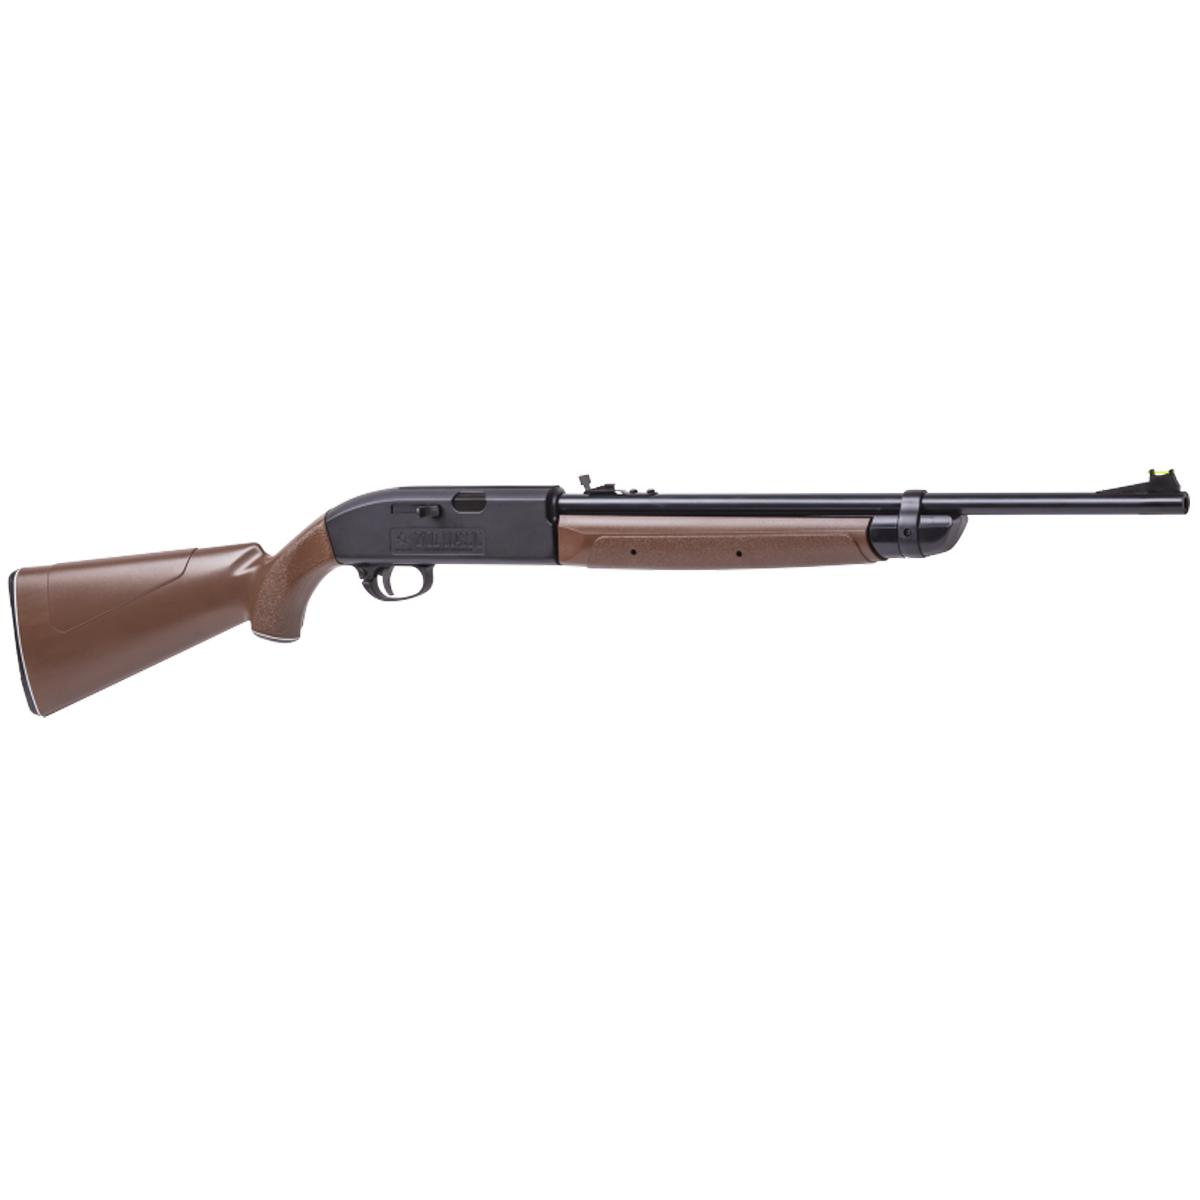 Rifle Bombeo Classic 2100 Mira Telescópica W/4x Caza Crosman